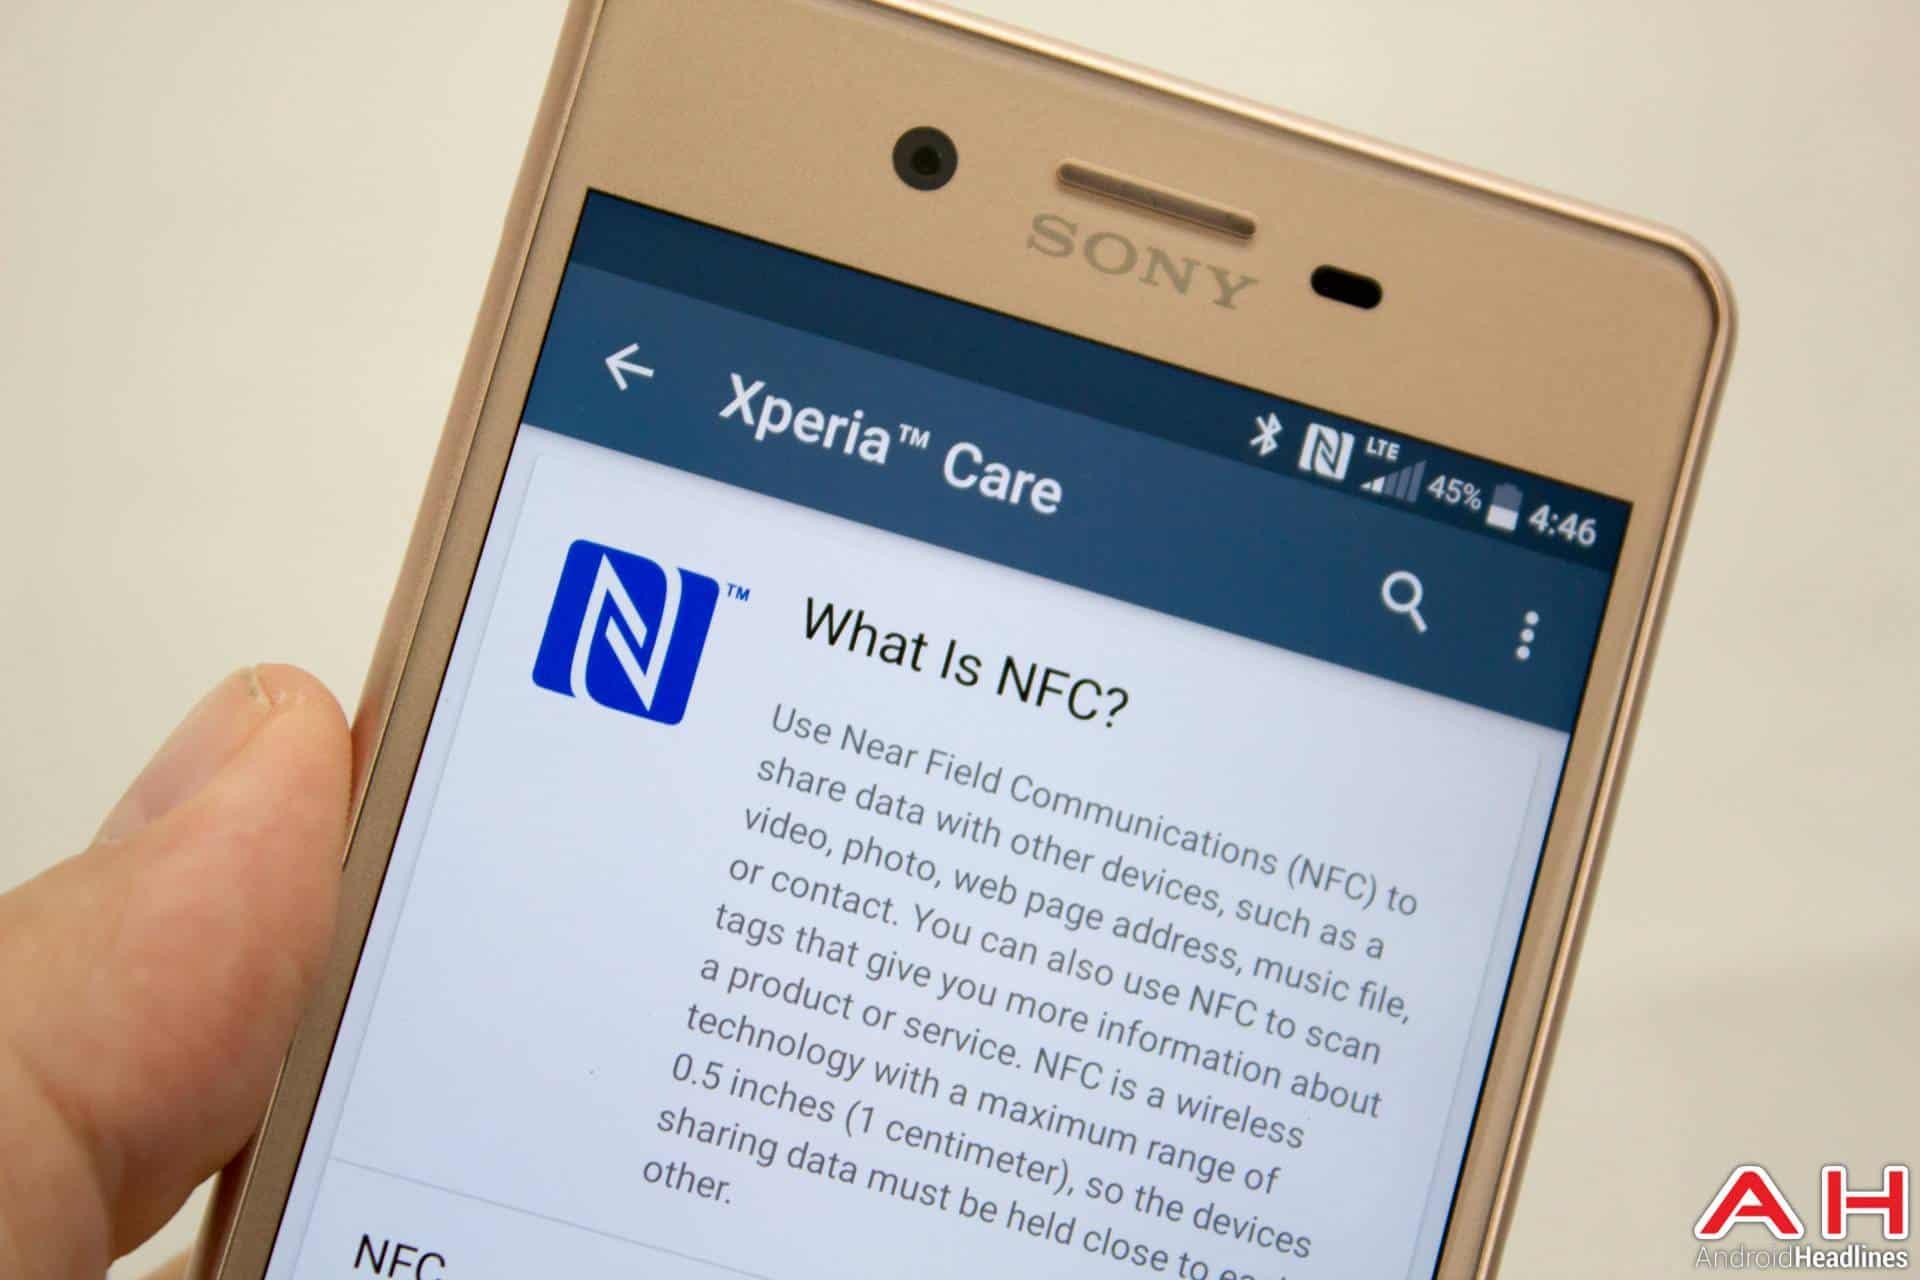 Sony-Xperia-X-Performance-AH-NS-wireless-nfc